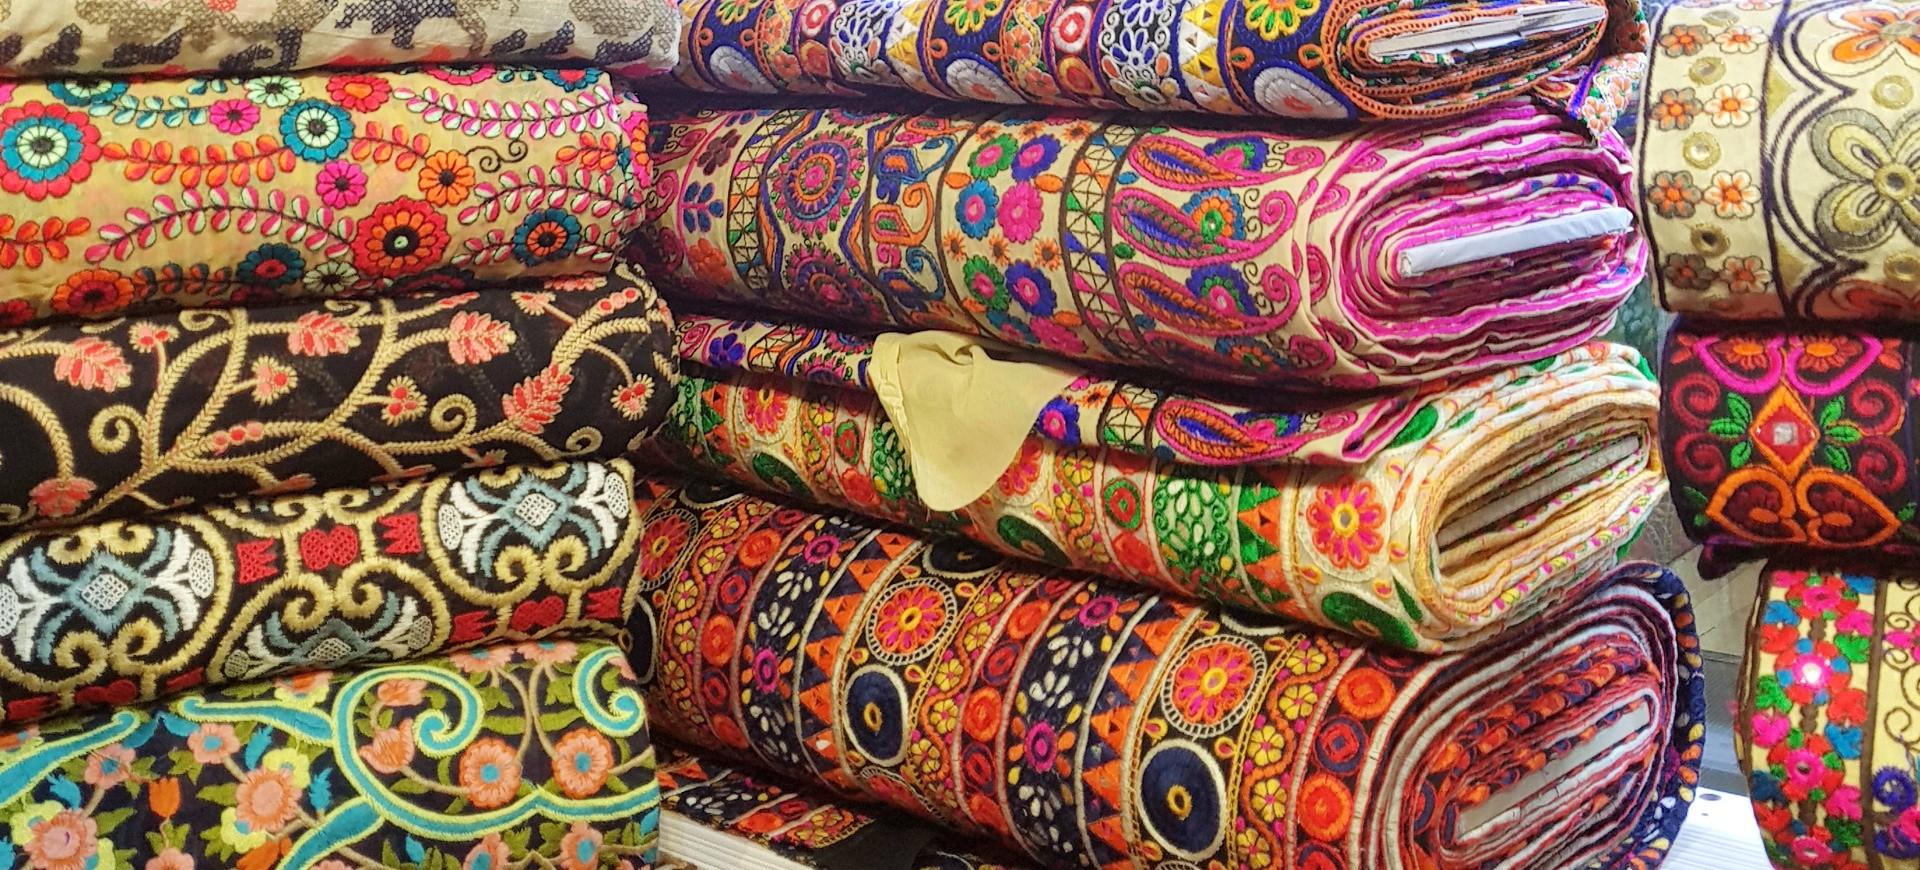 Bazar à Téhéran en Iran